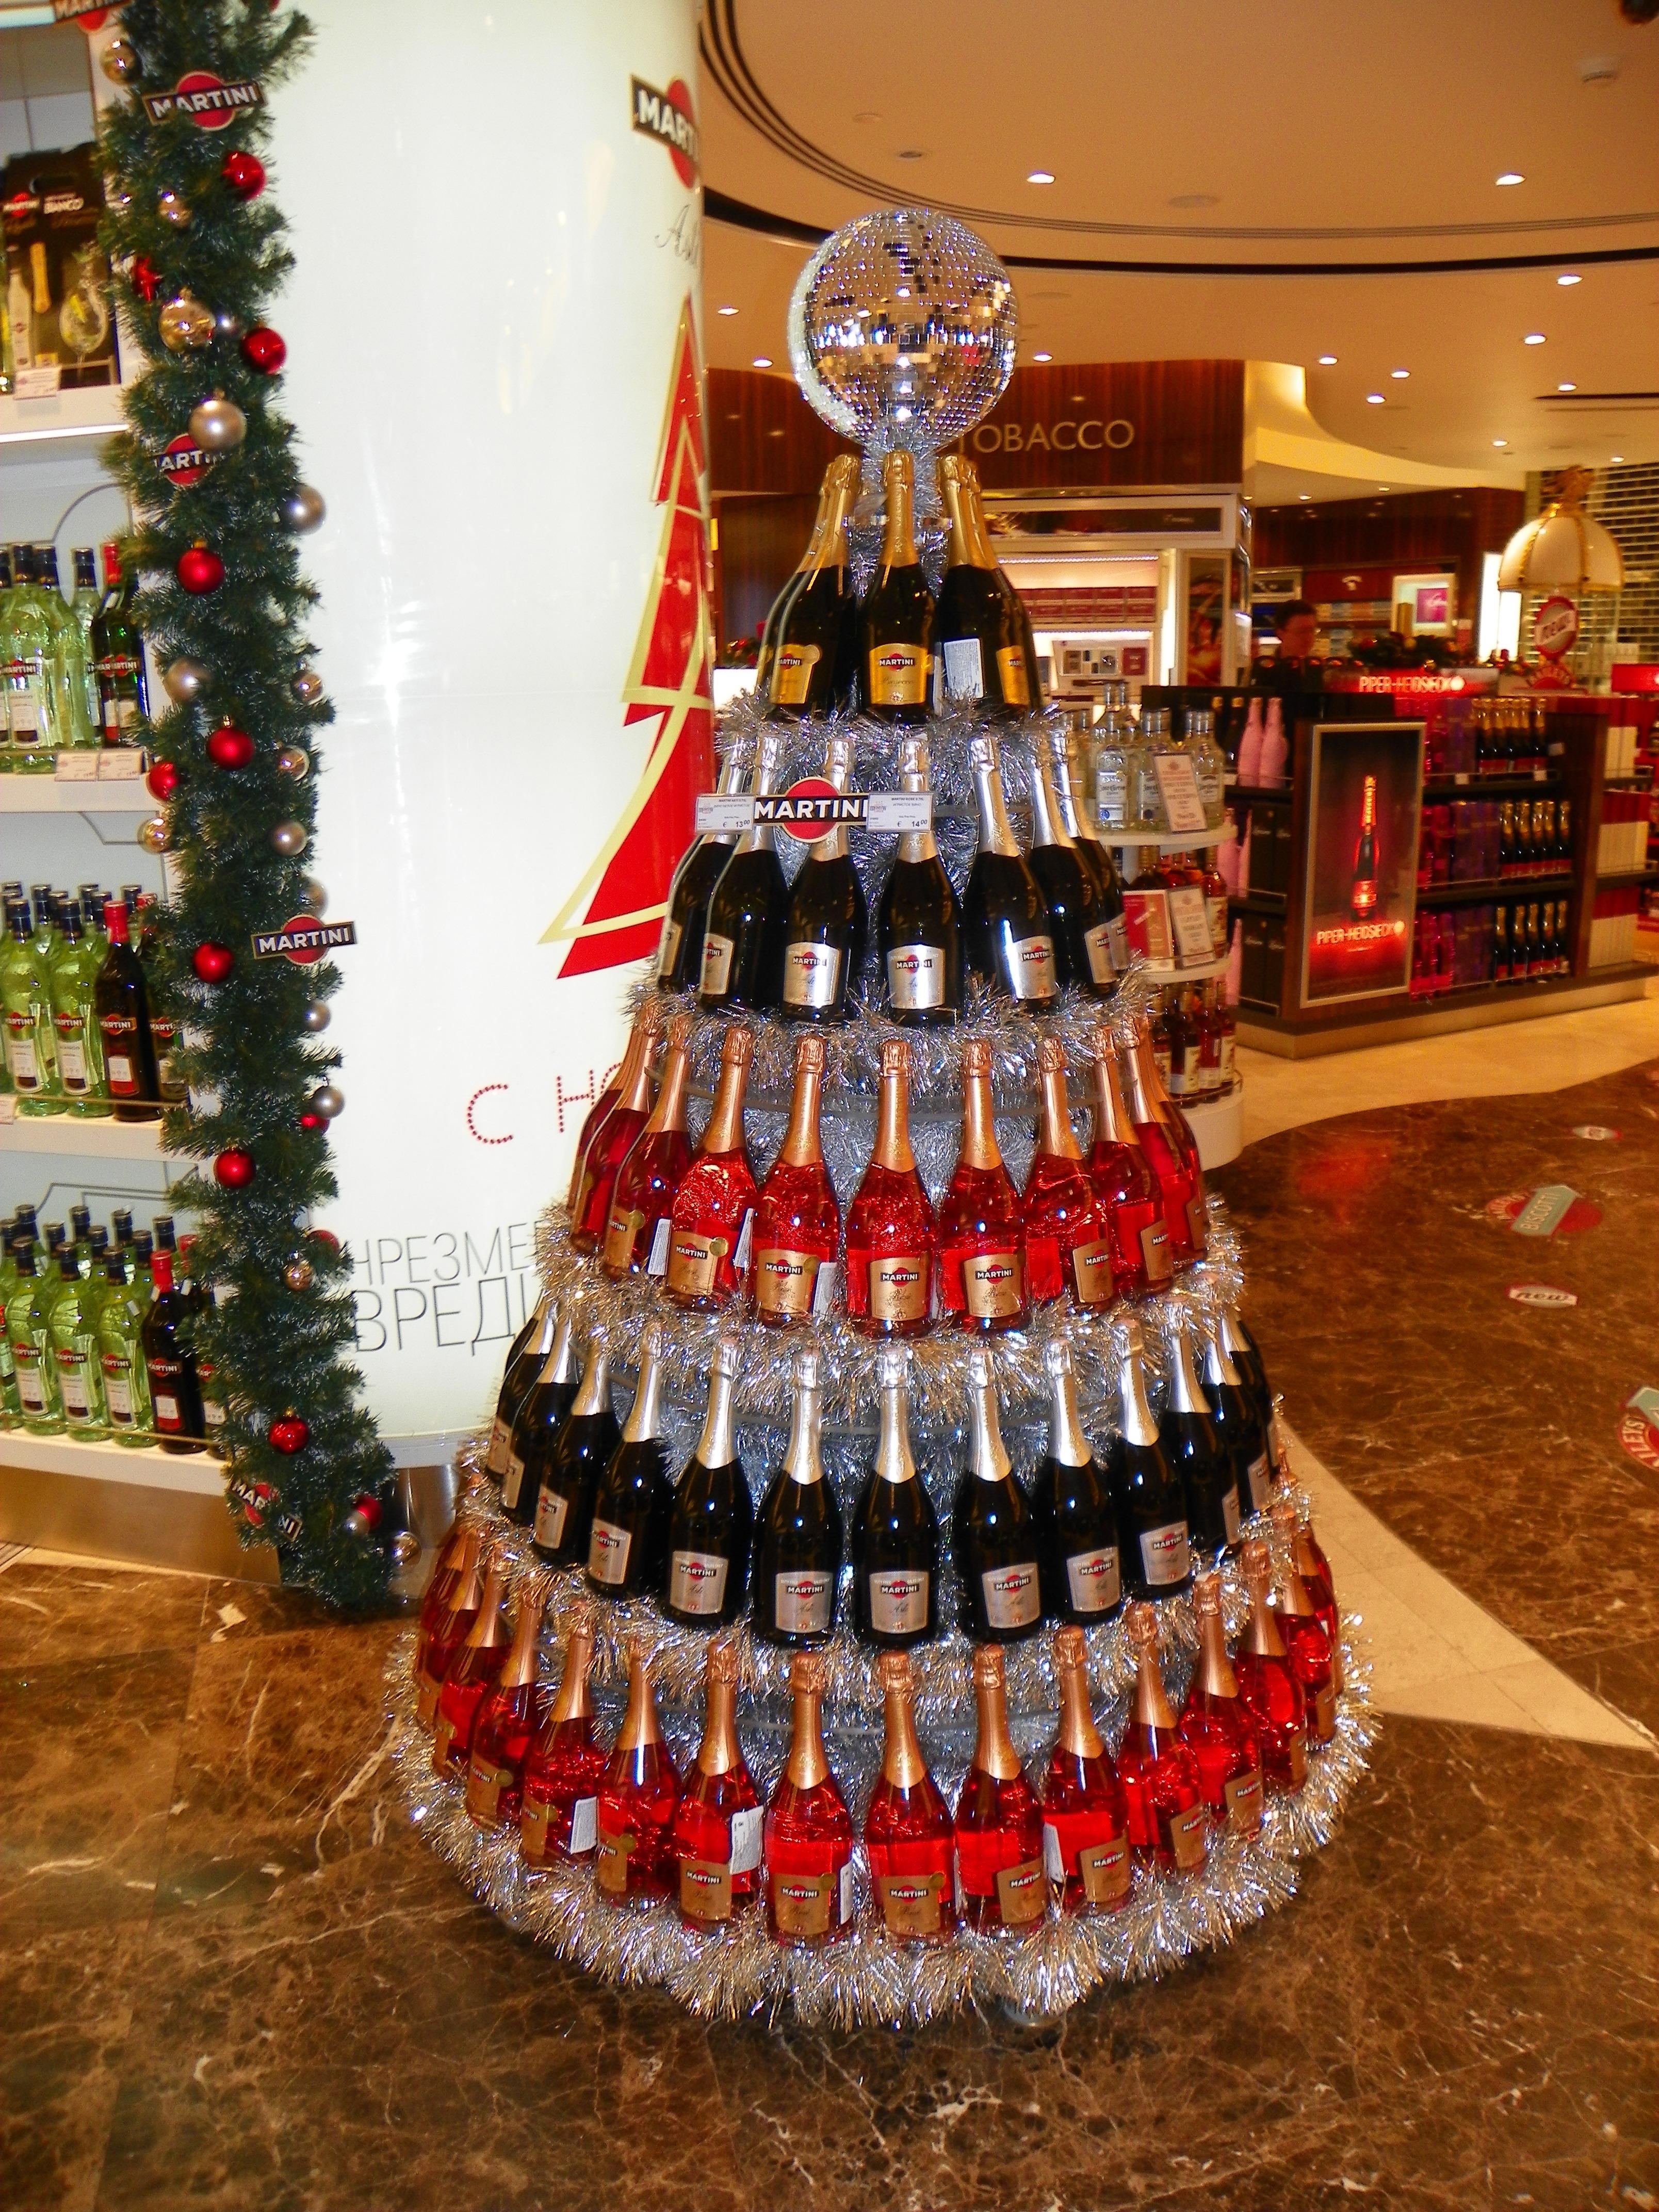 POS Merchandise – Bottle Christmas tree by Martini